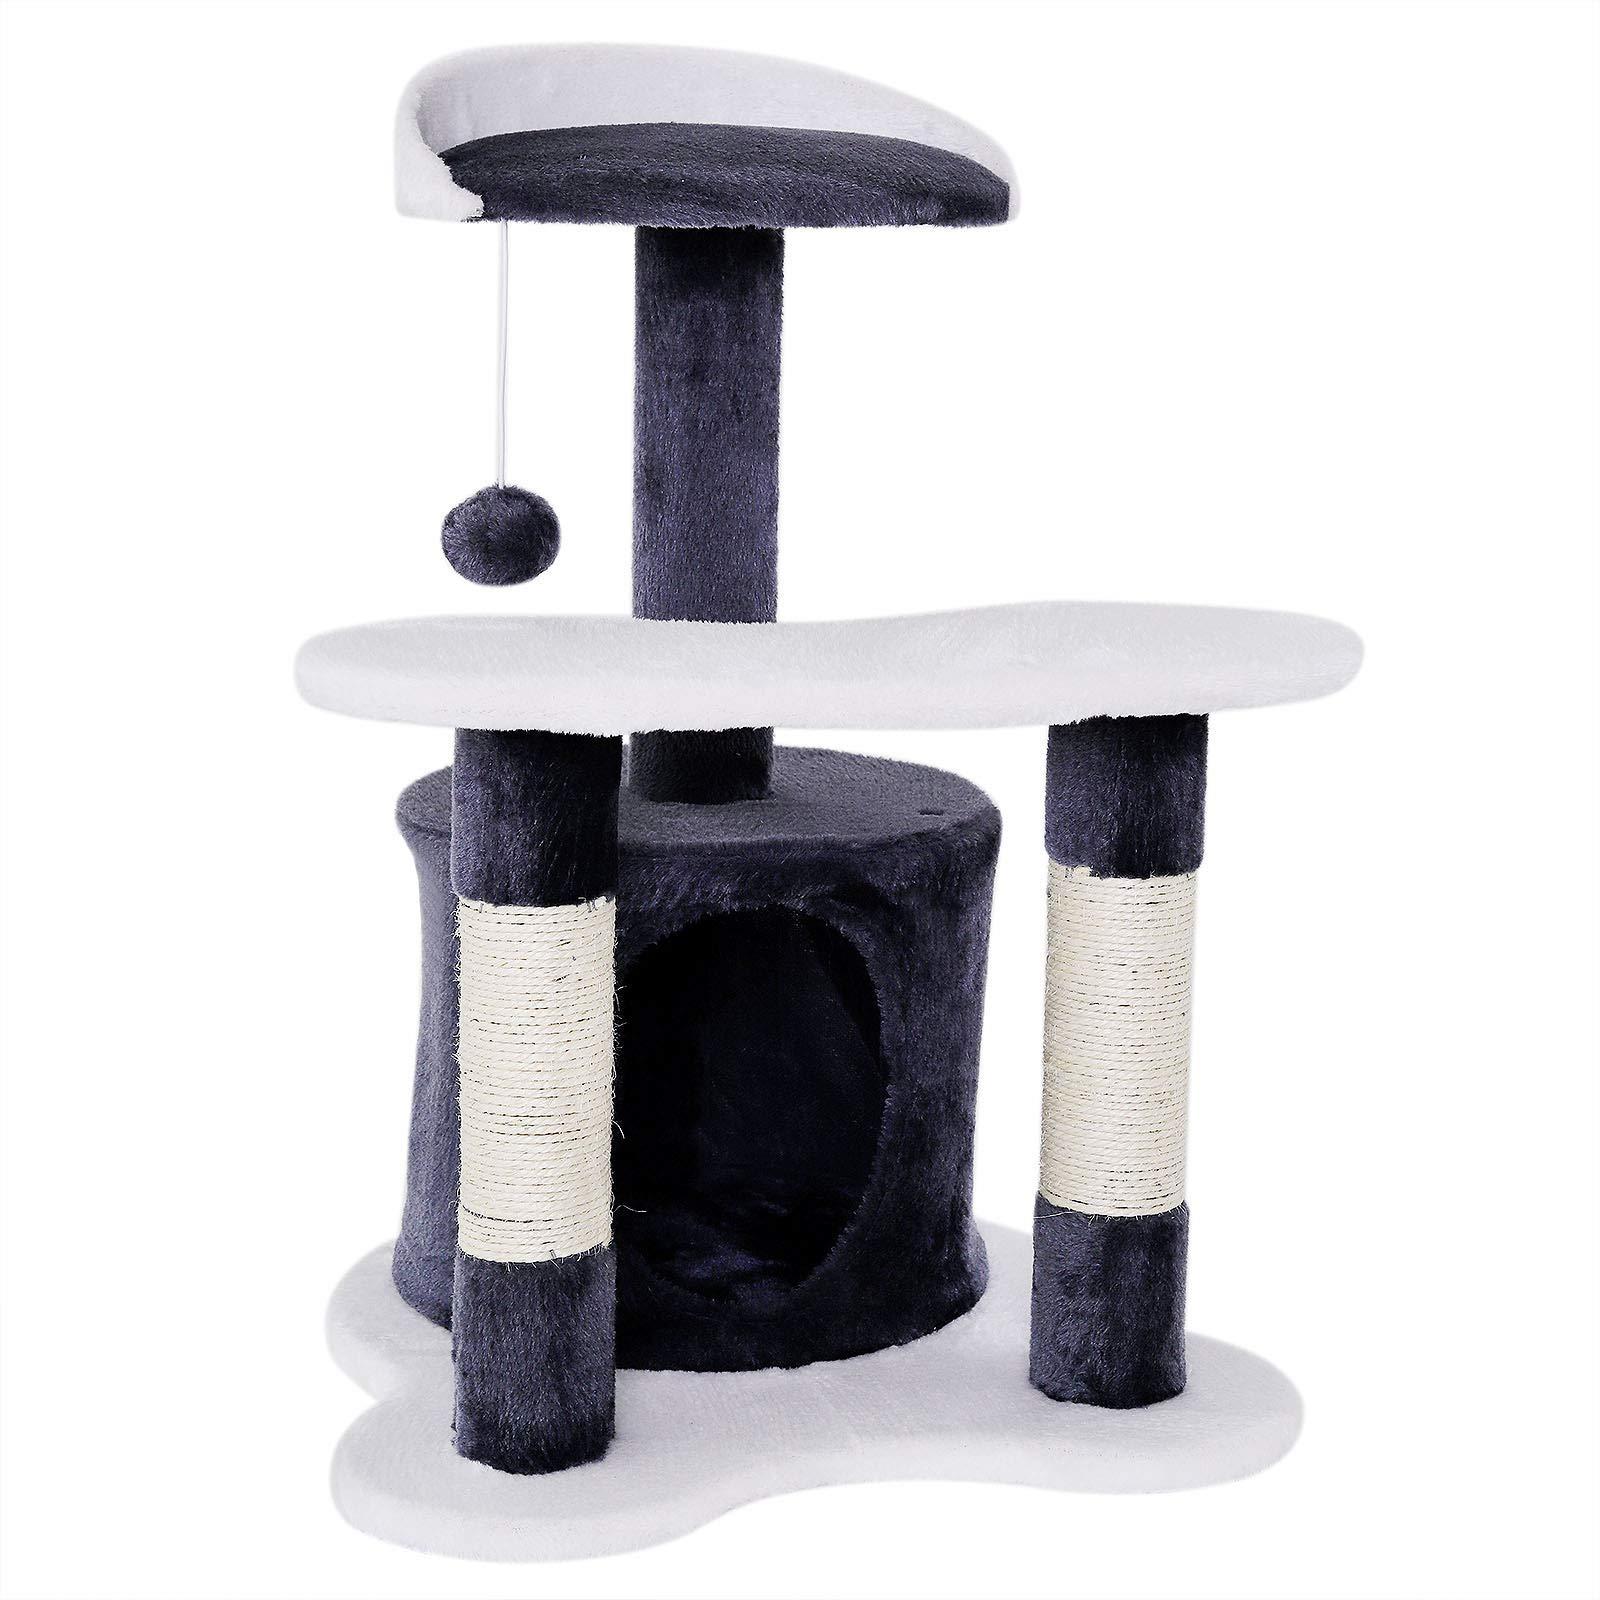 Dibea KB00350 Rascador para Gatos, 133 Cm, Árbol Escalador Arañar Juguete Beige